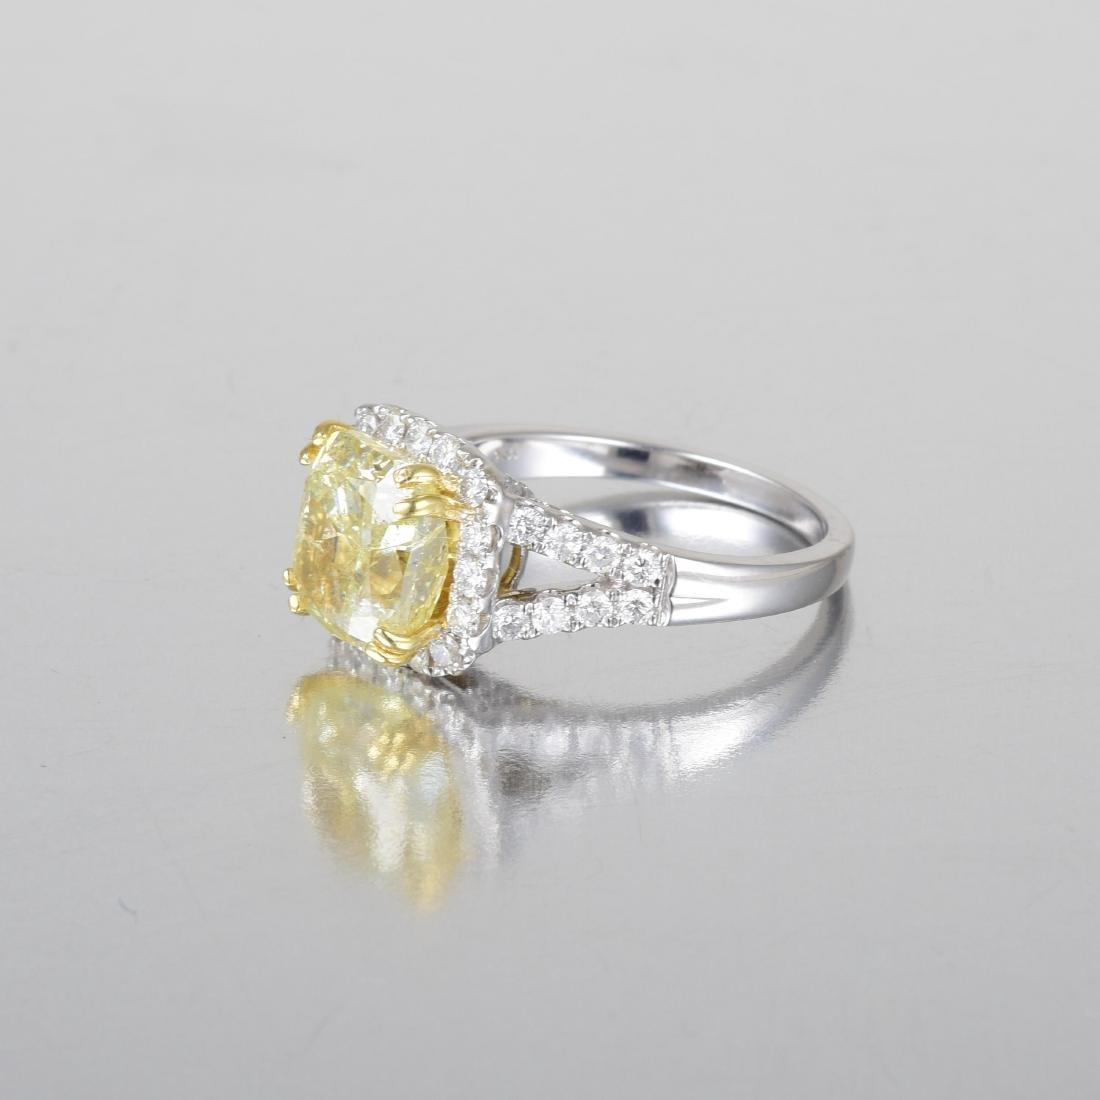 A 3.80-Carat Yellow Diamond Ring - 2